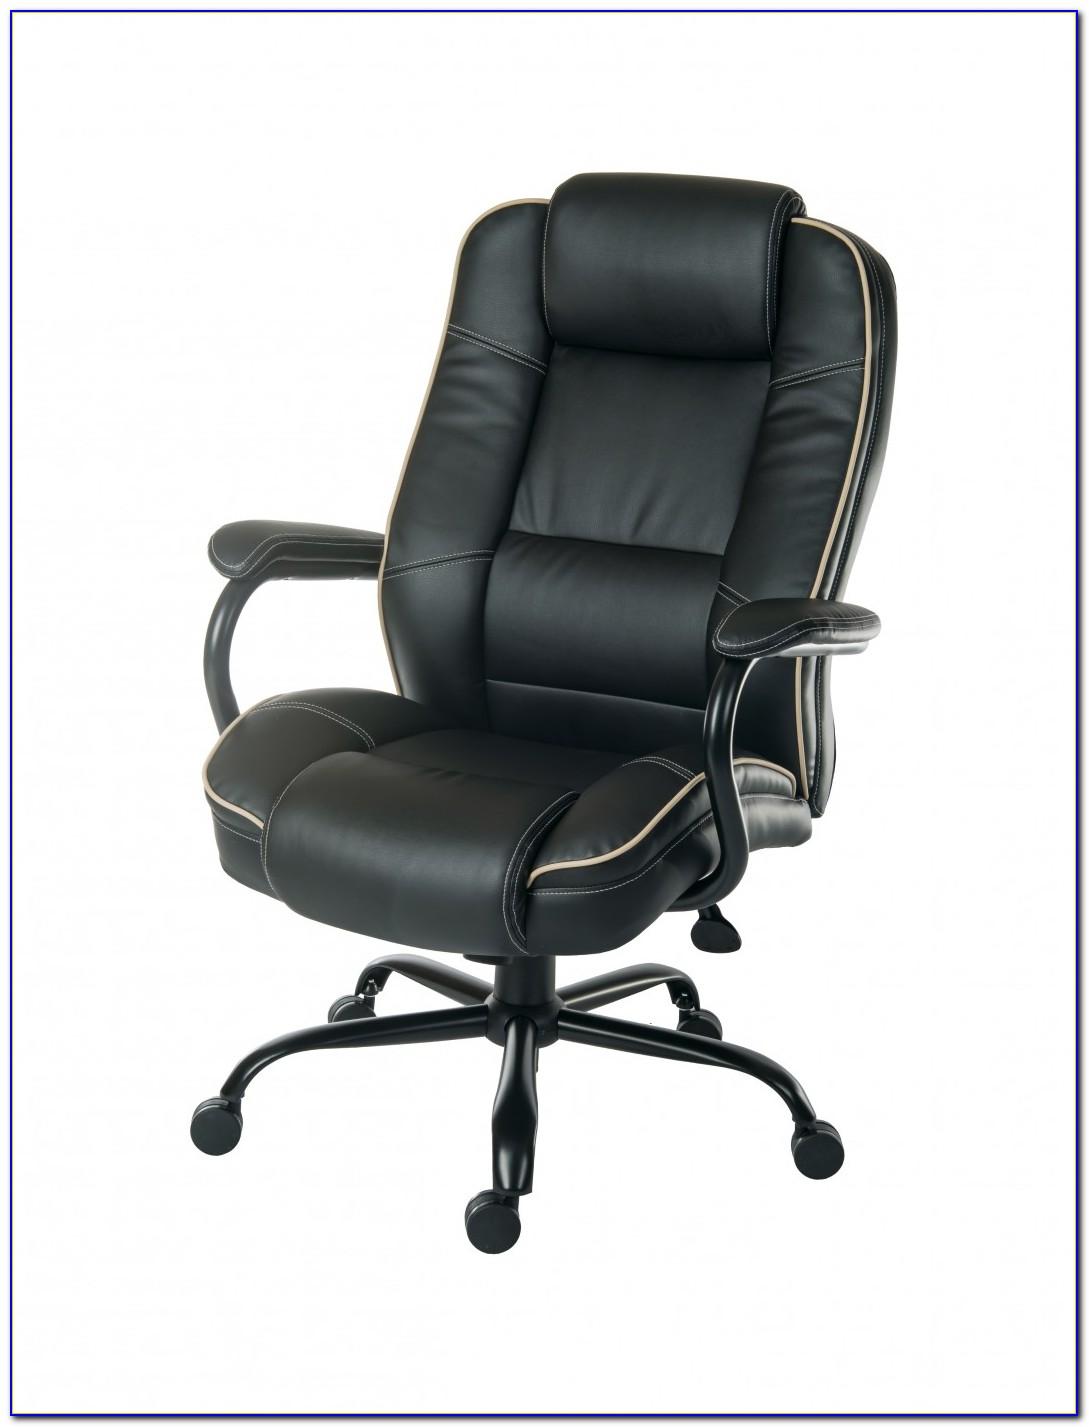 Heavy Duty Office Chair Tilt Mechanism